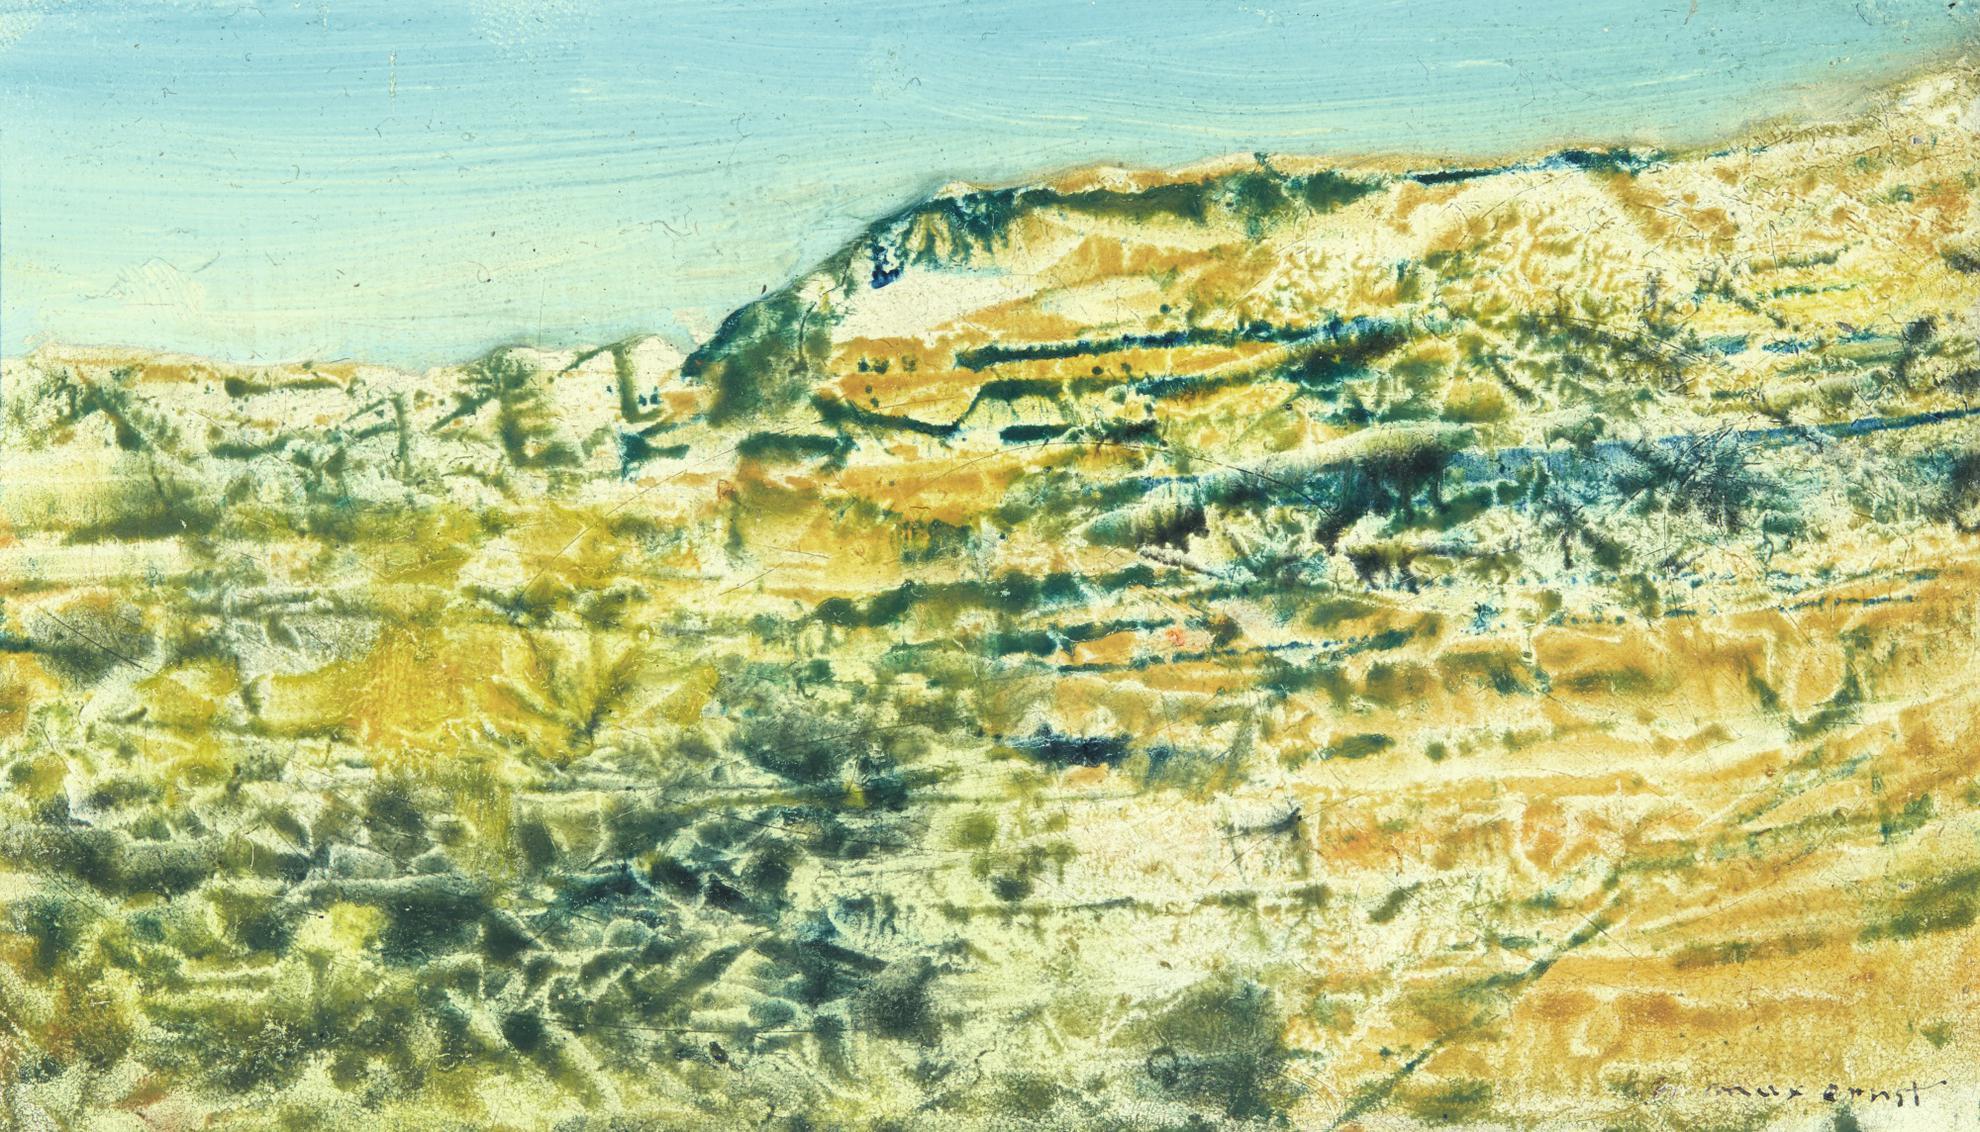 Max Ernst-Arizona-1950